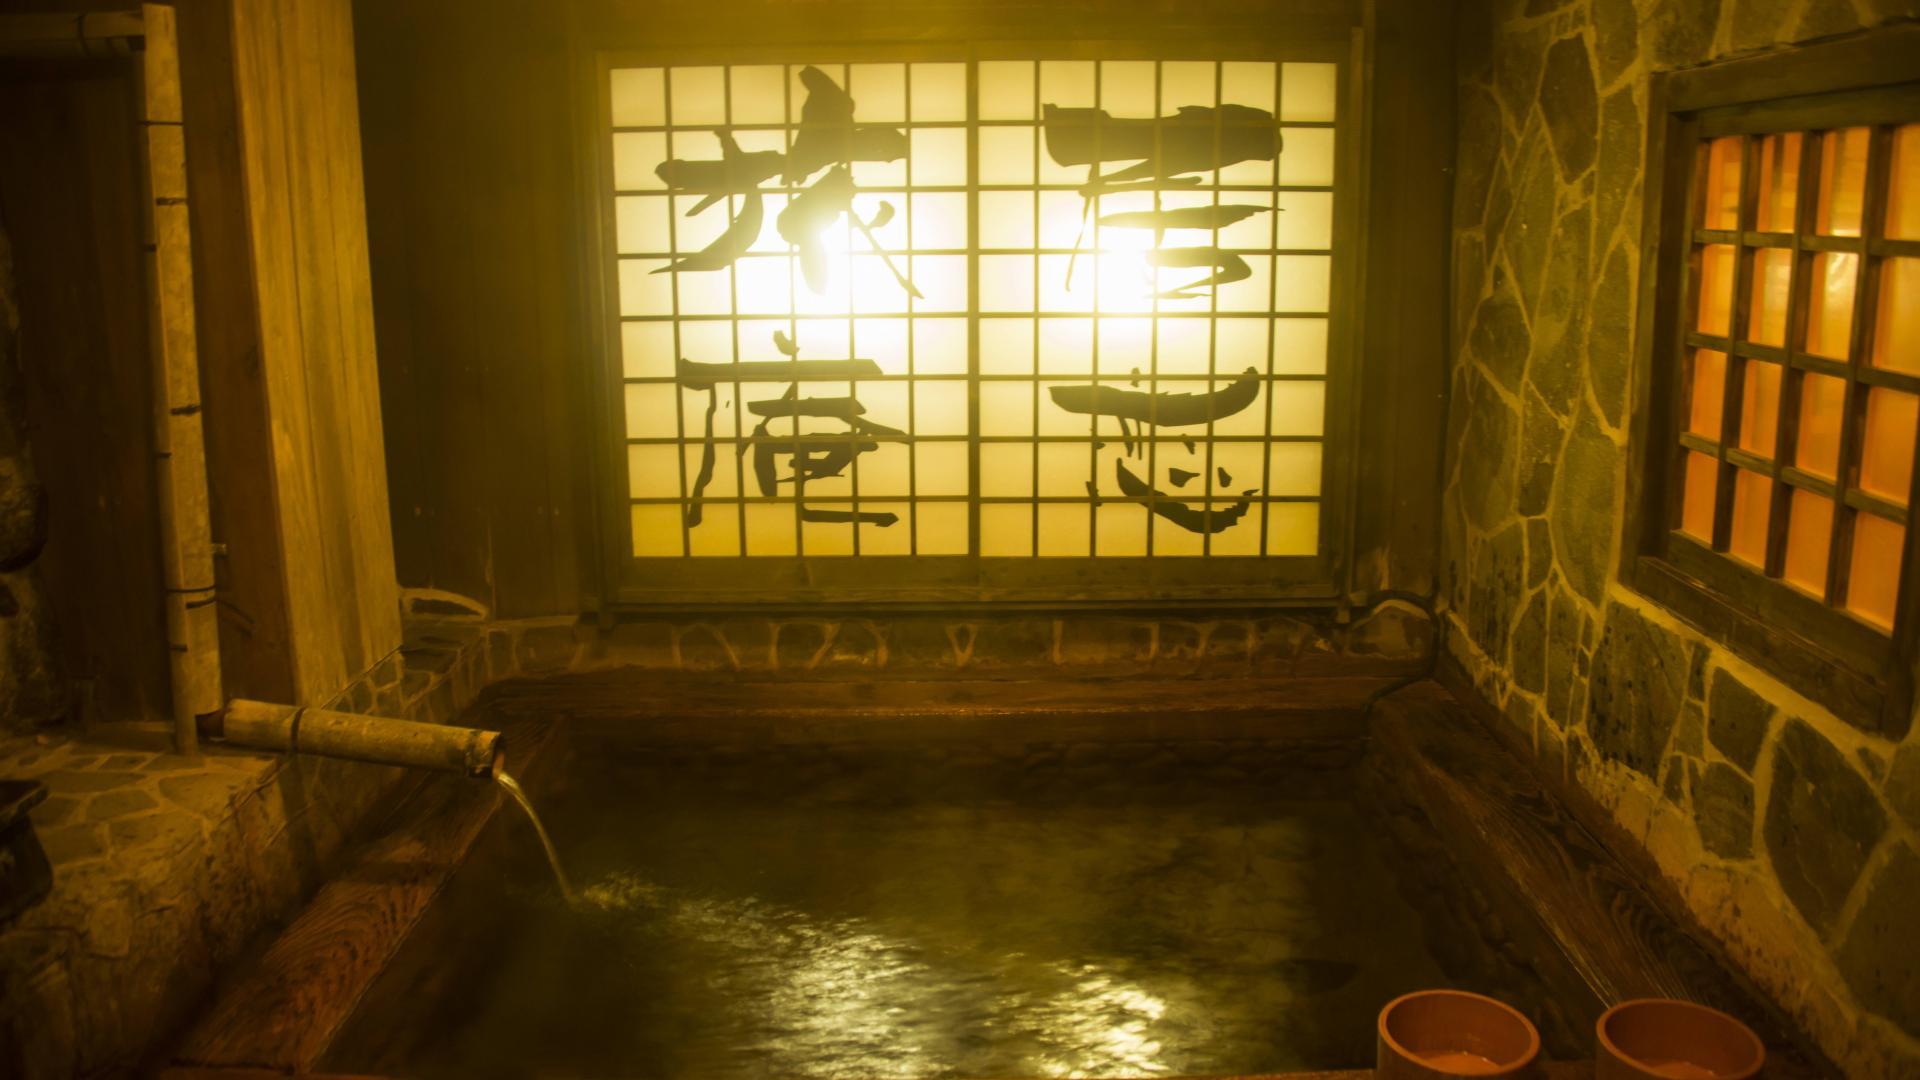 Onsen, Bad, Japan, Badekultur, Entspannung, heiße Quelle.